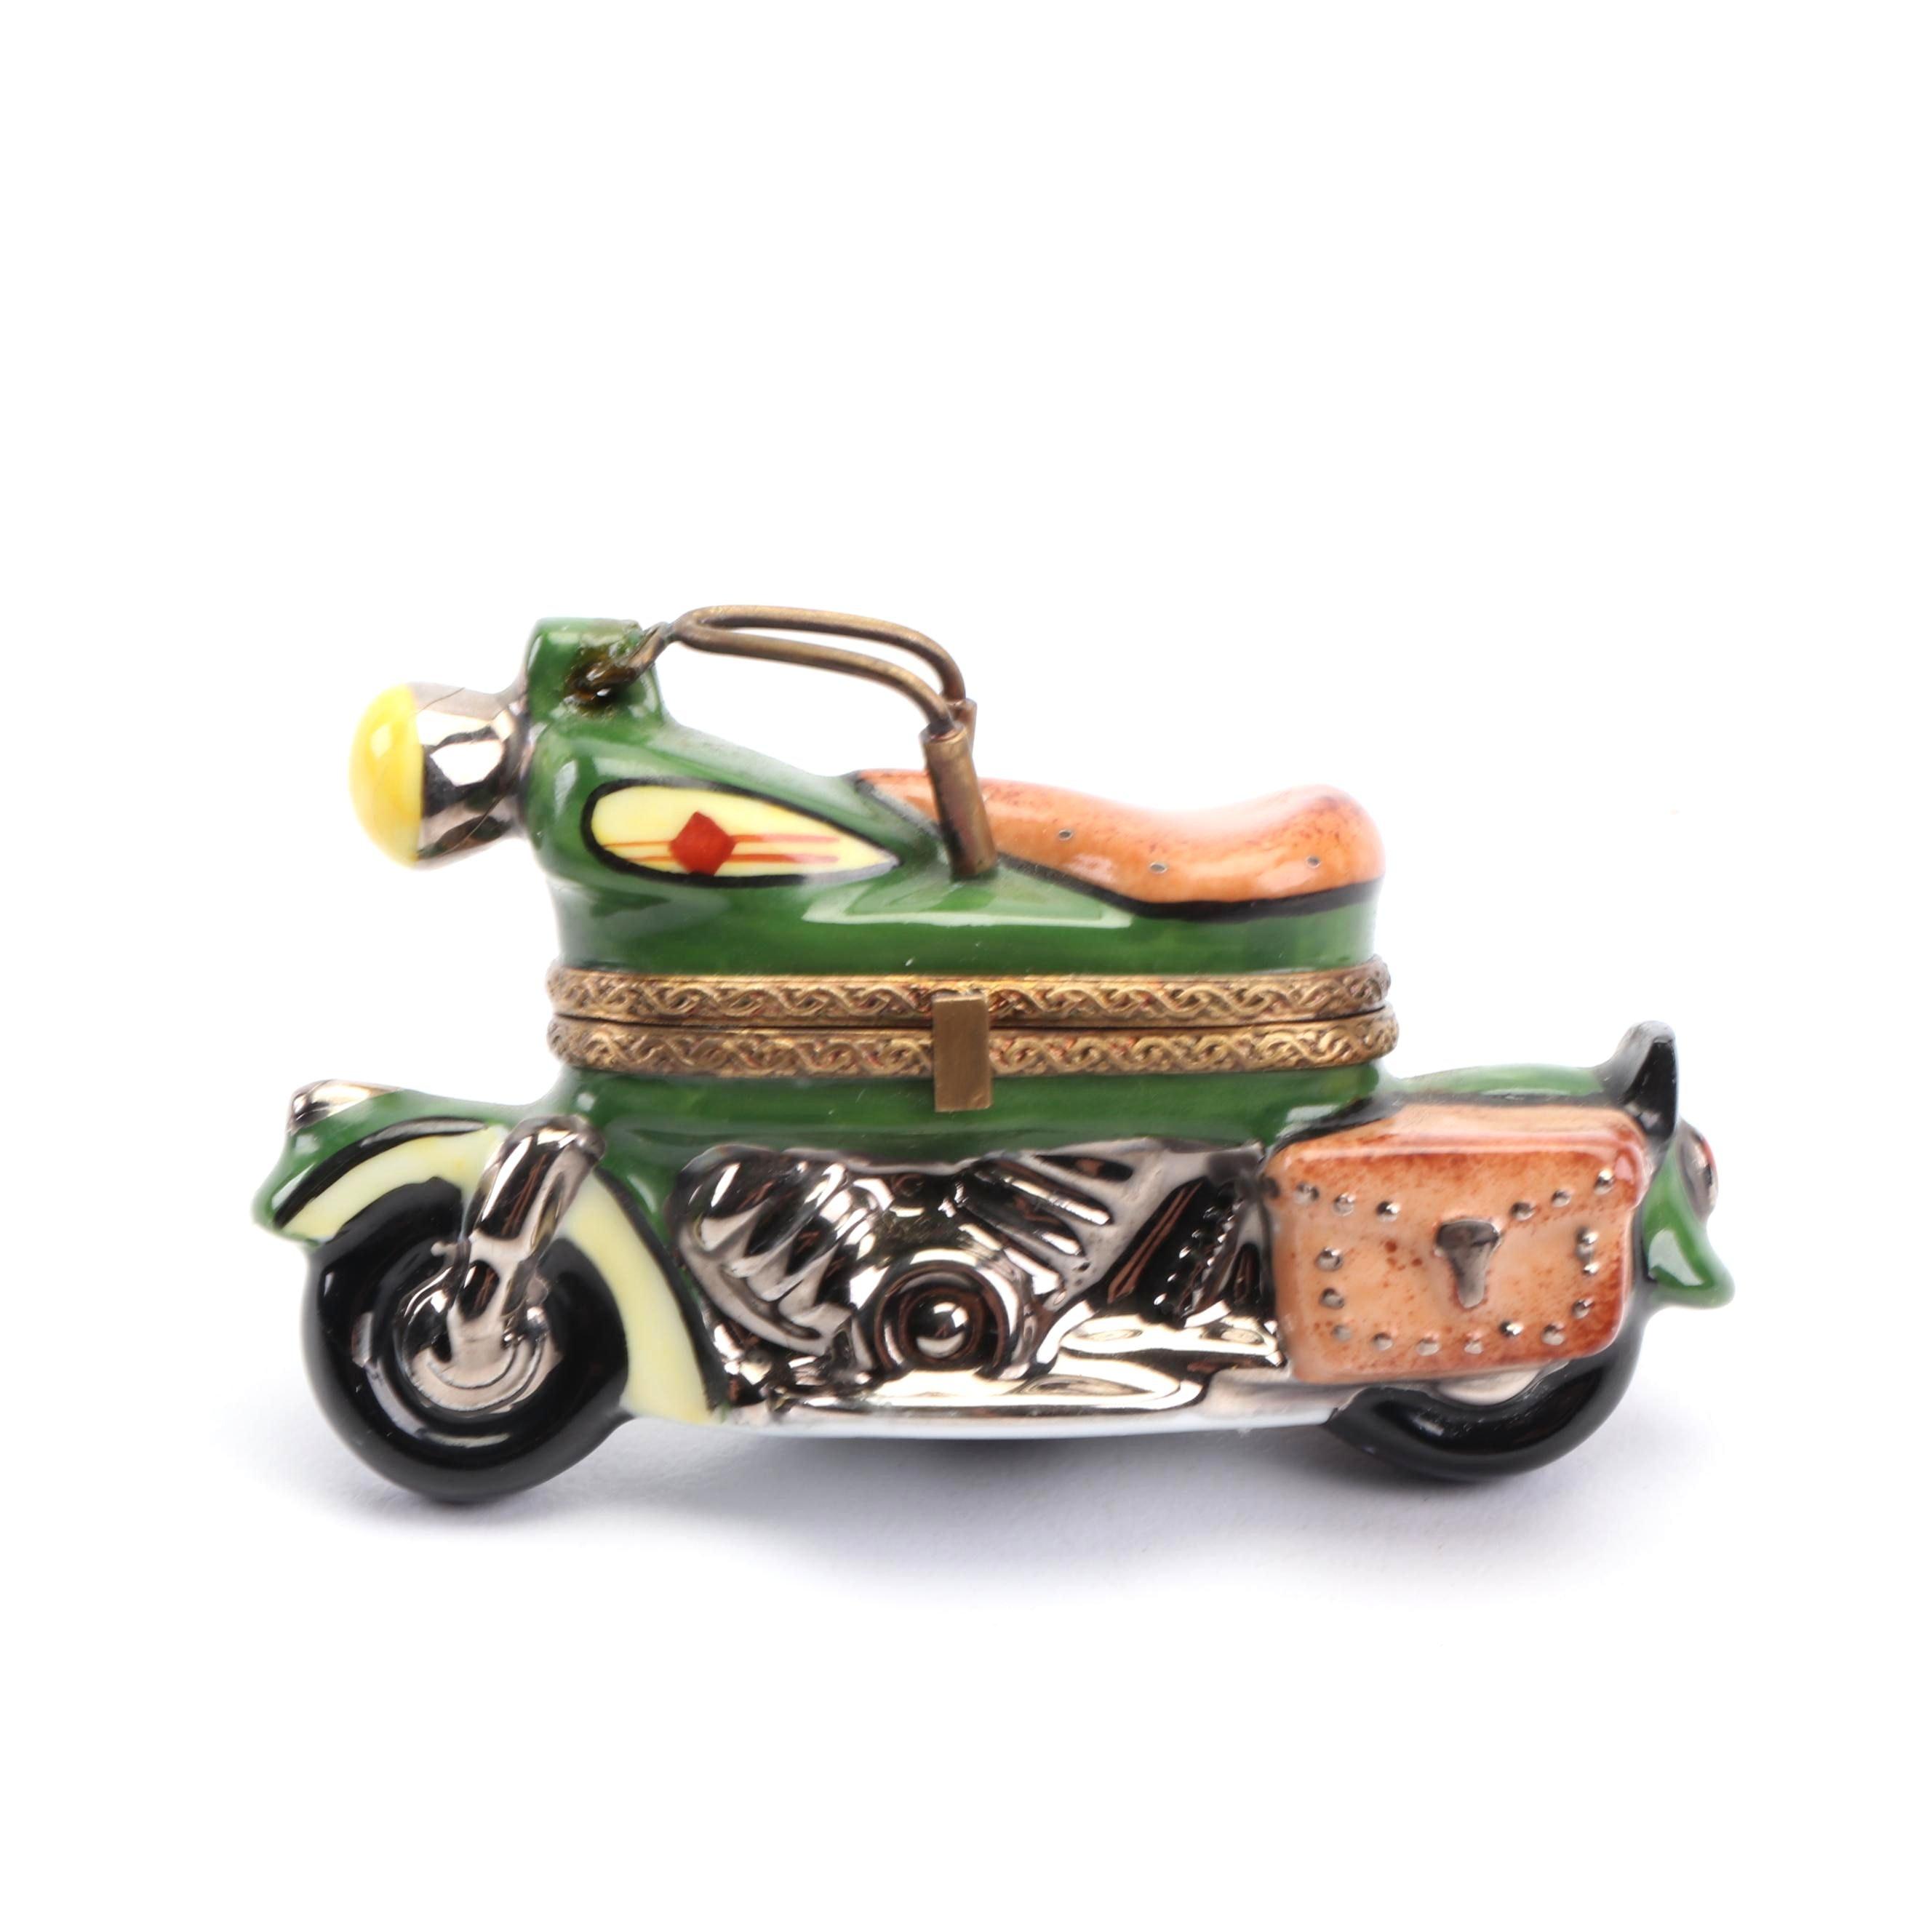 La Gloriette Limoges Hand-Painted Porcelain Motorcycle Shaped Trinket Box